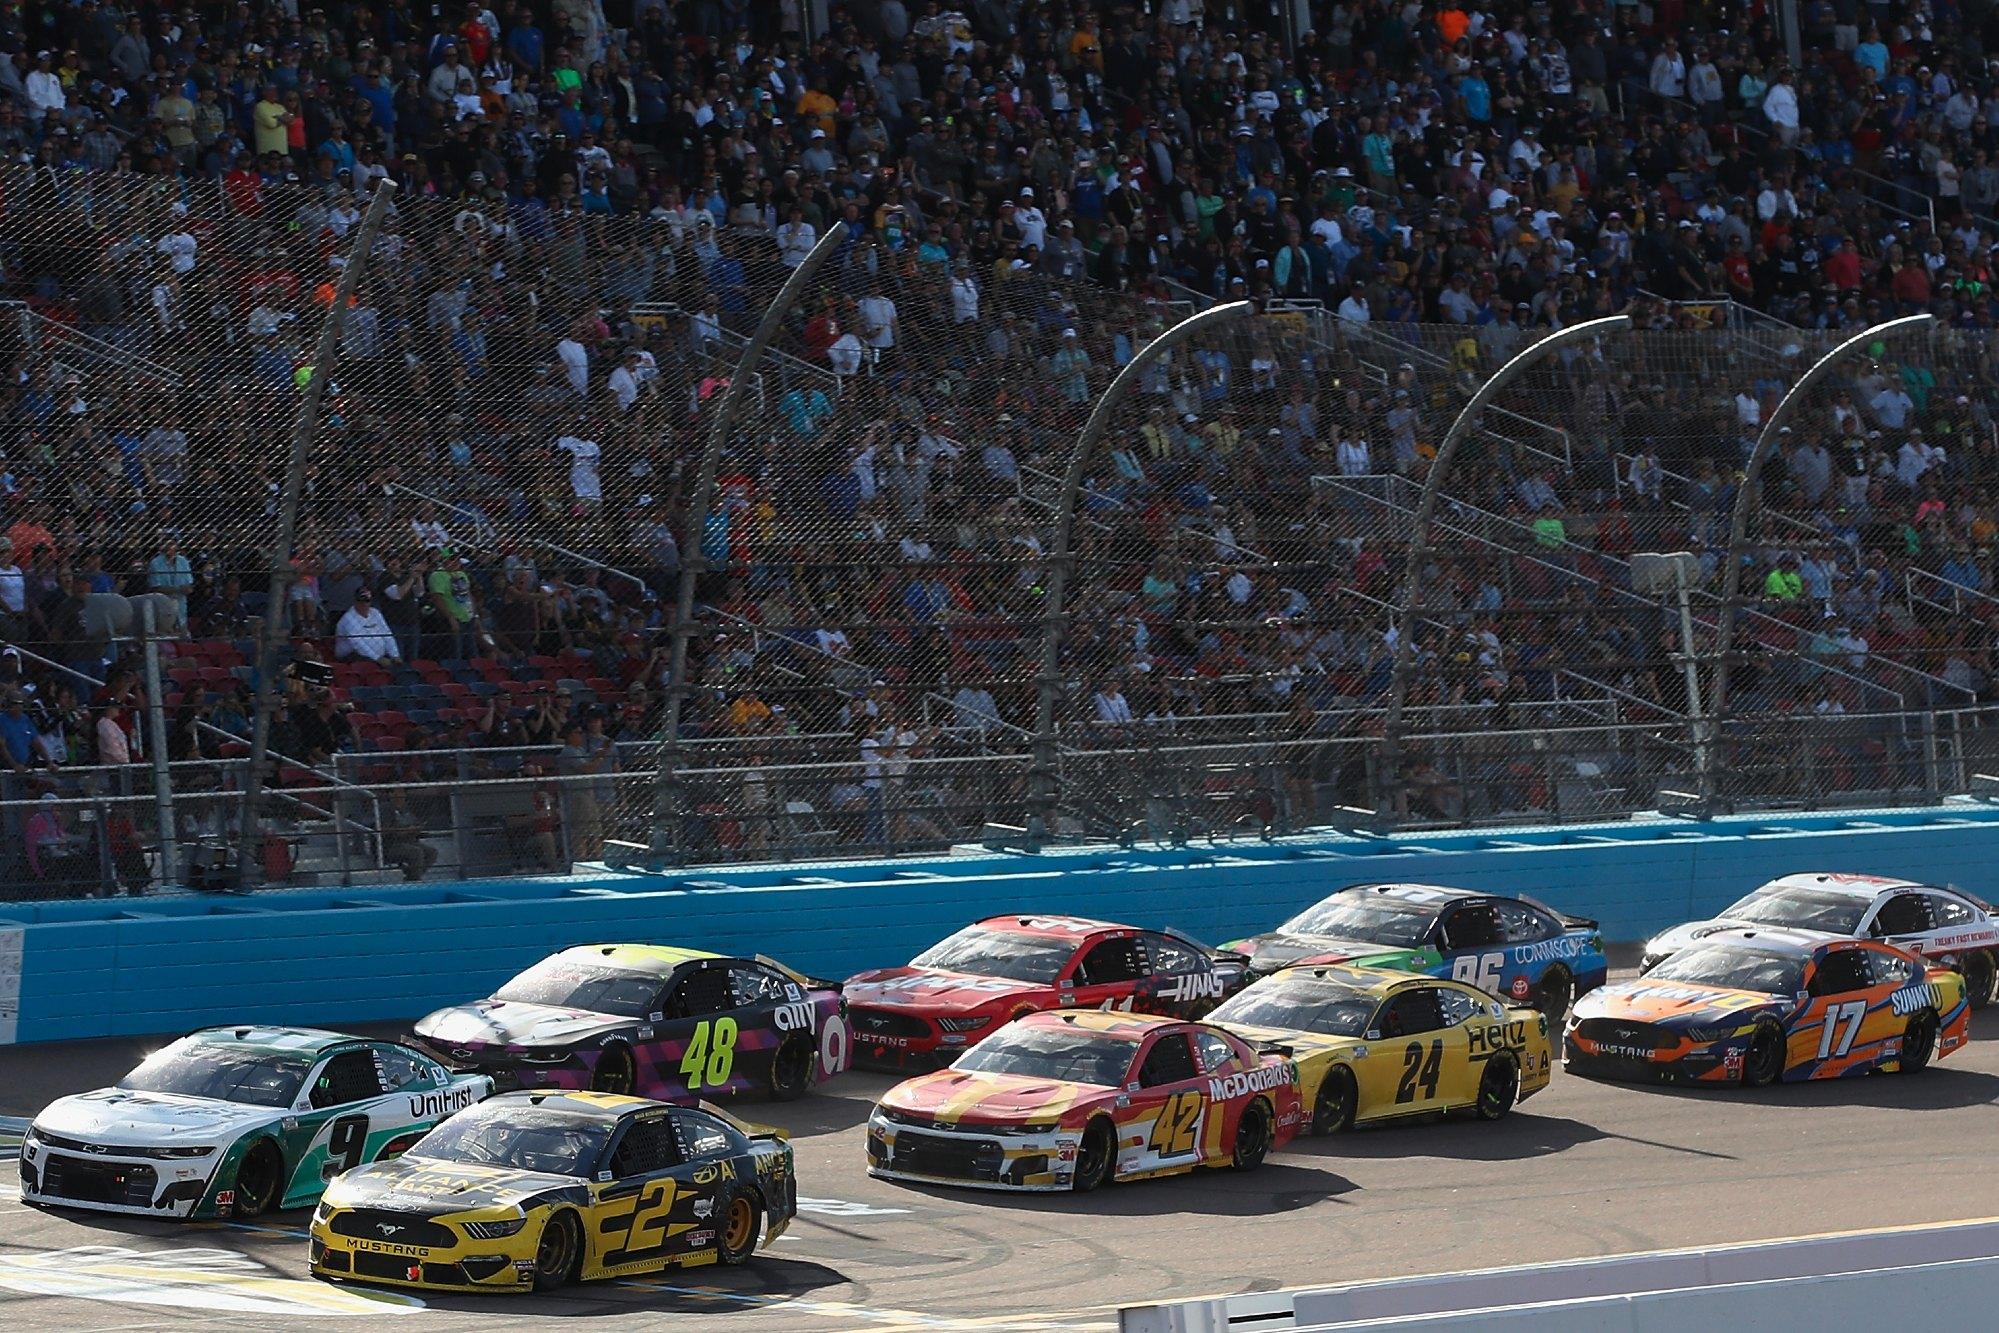 NASCAR at ISM in Spring 2020